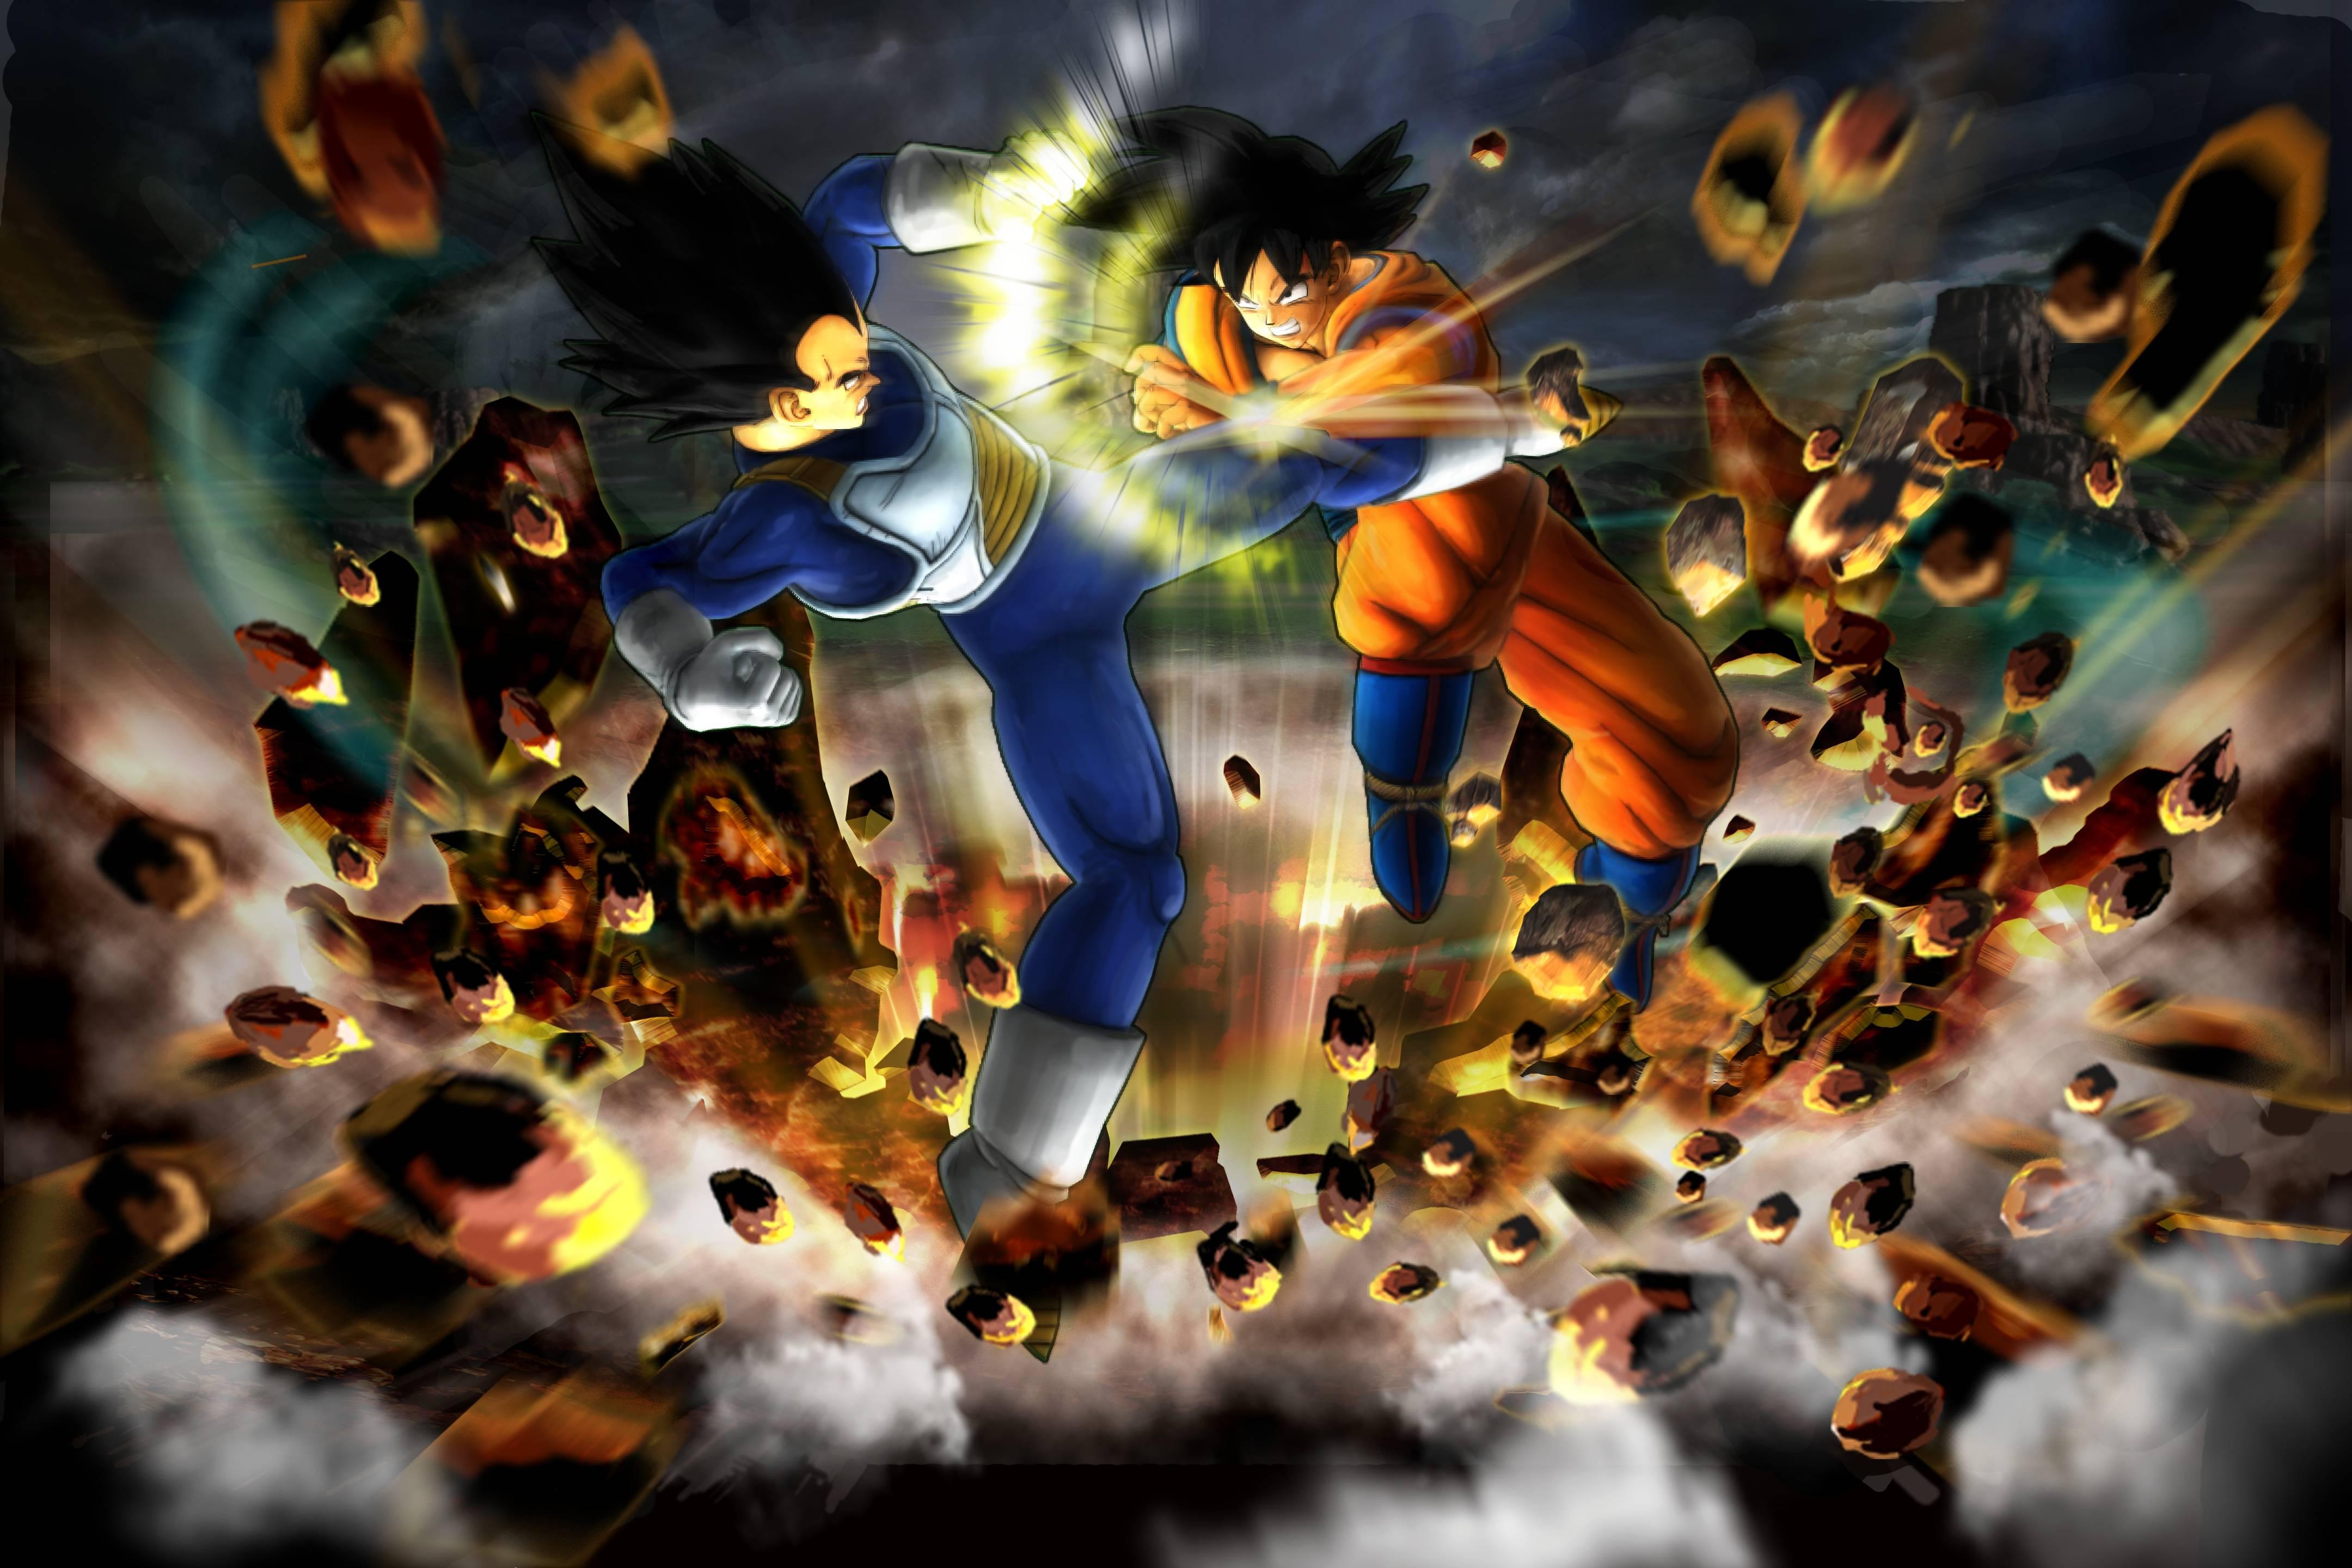 Dragon Ball Z Wallpapers Kamehameha Wallpaper Cave